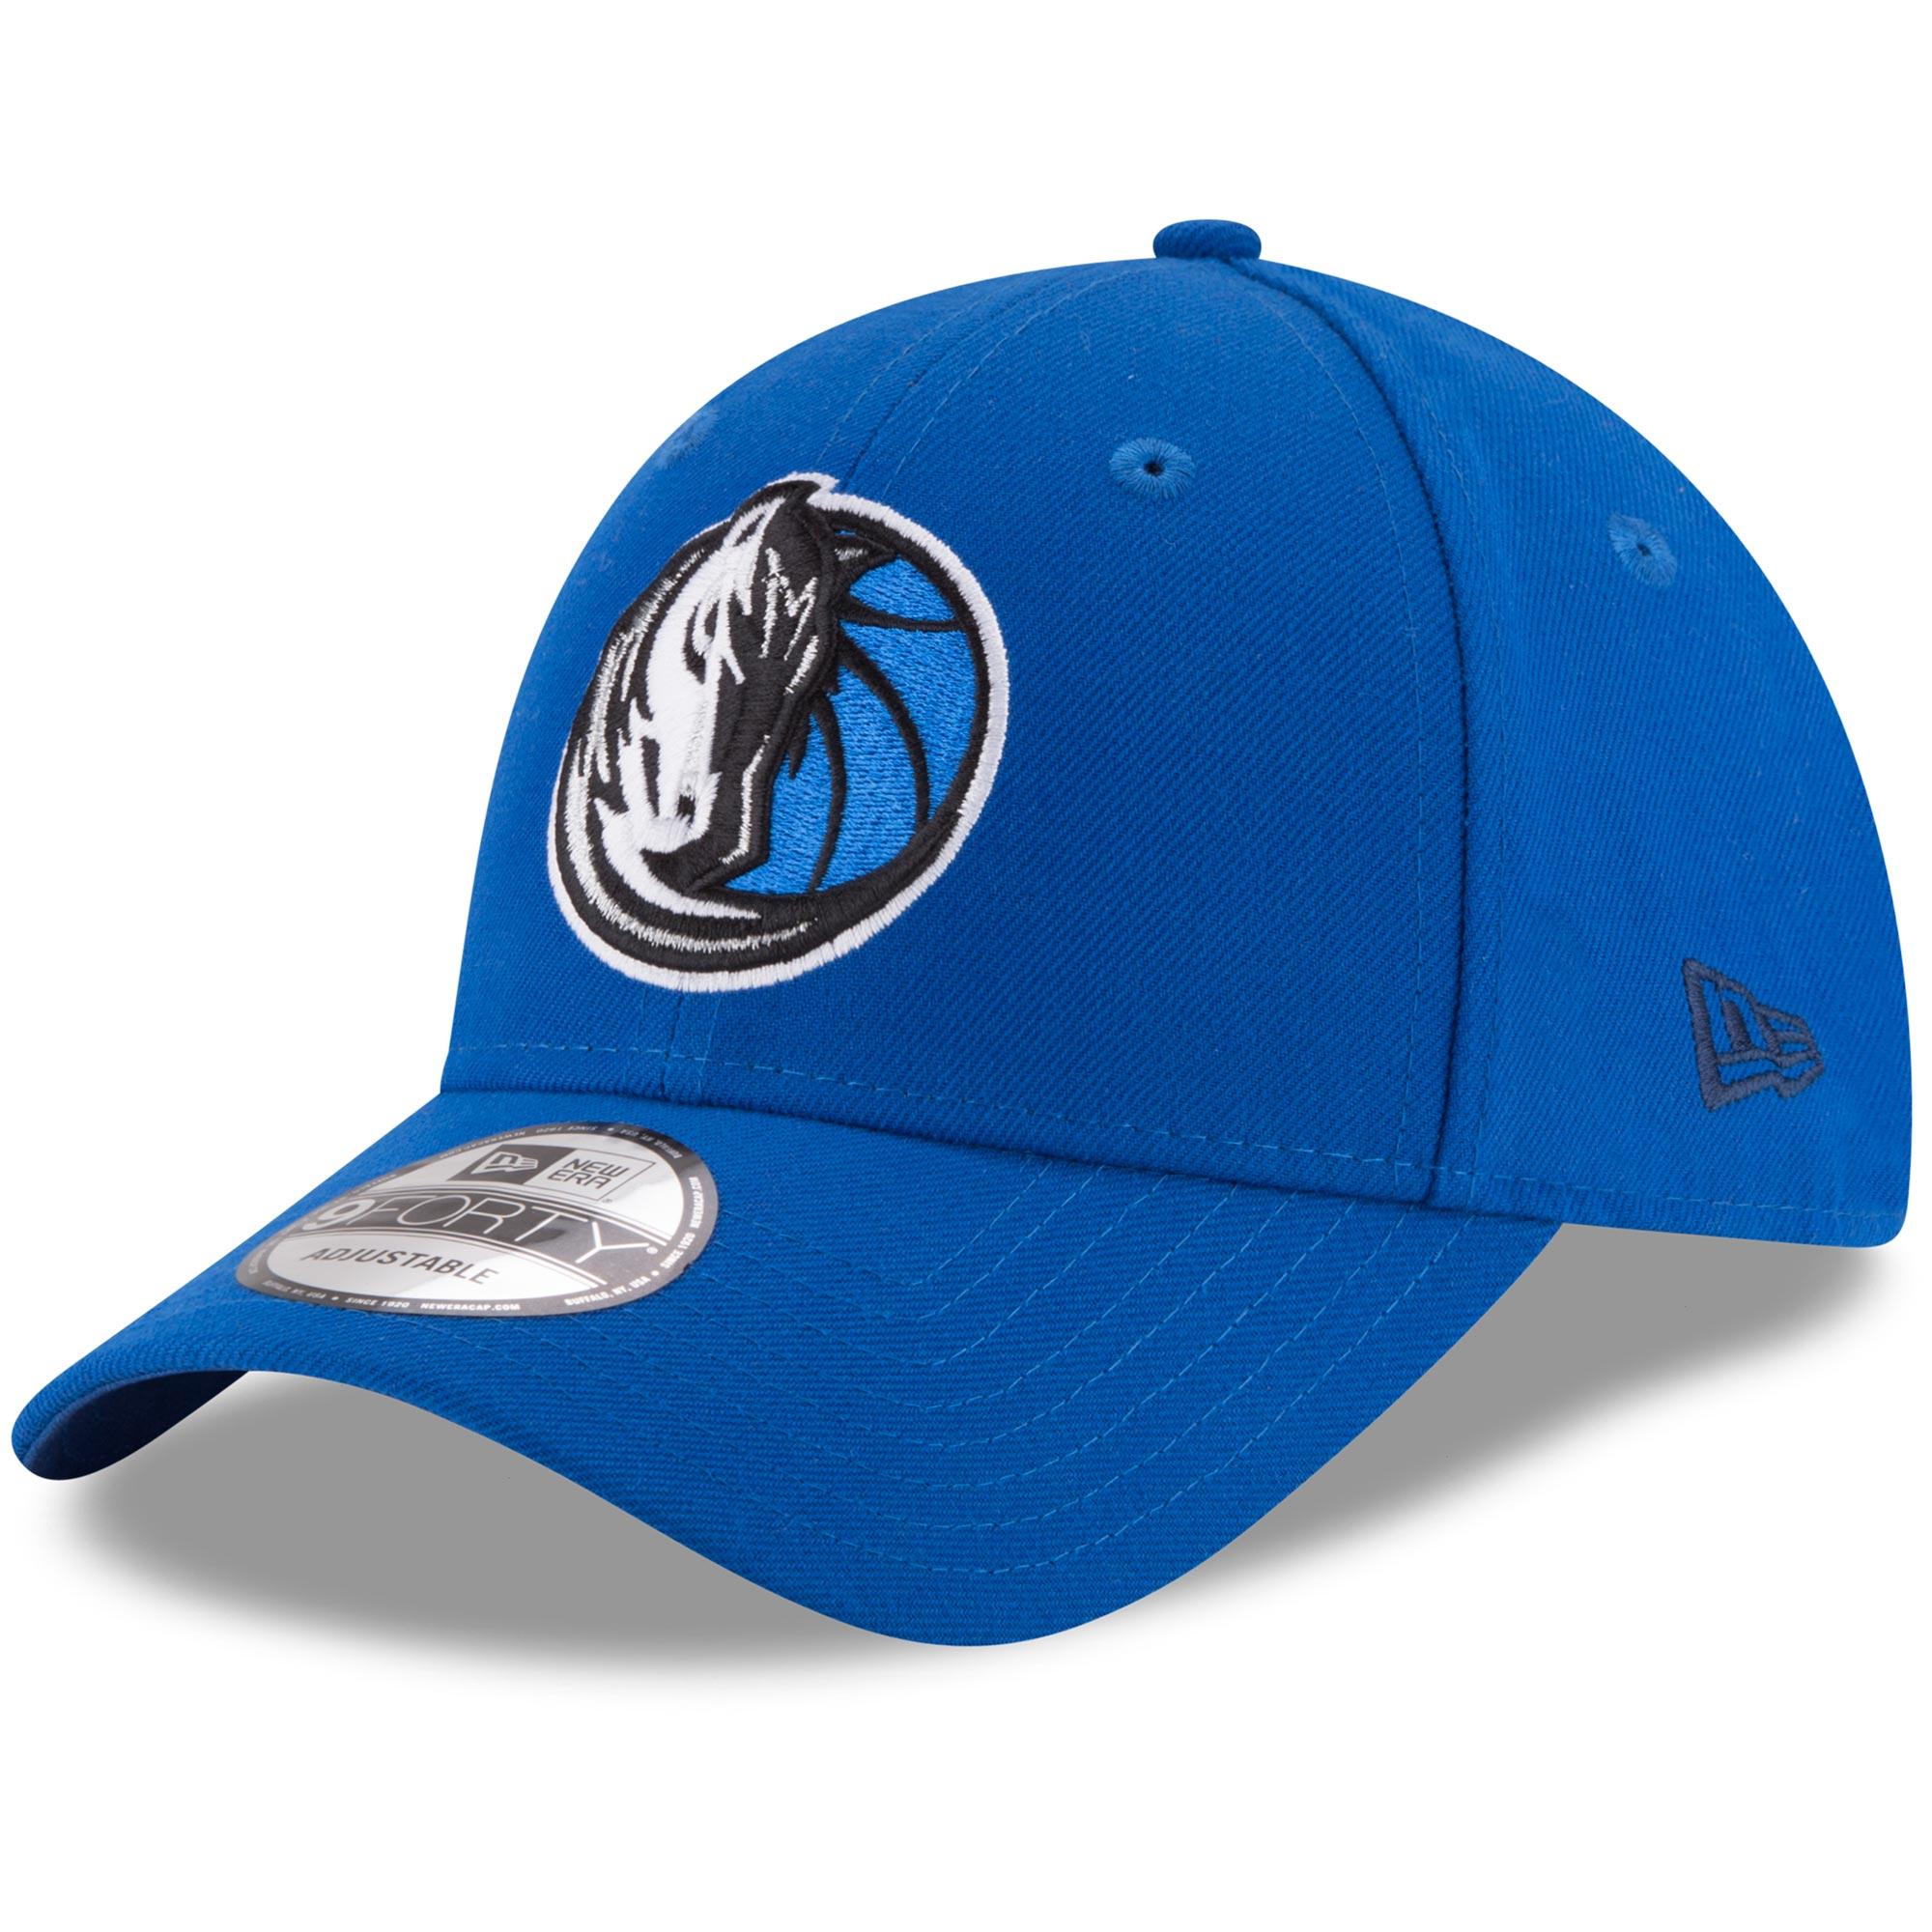 Dallas Mavericks New Era Official Team Color 9FORTY Adjustable Hat - Blue